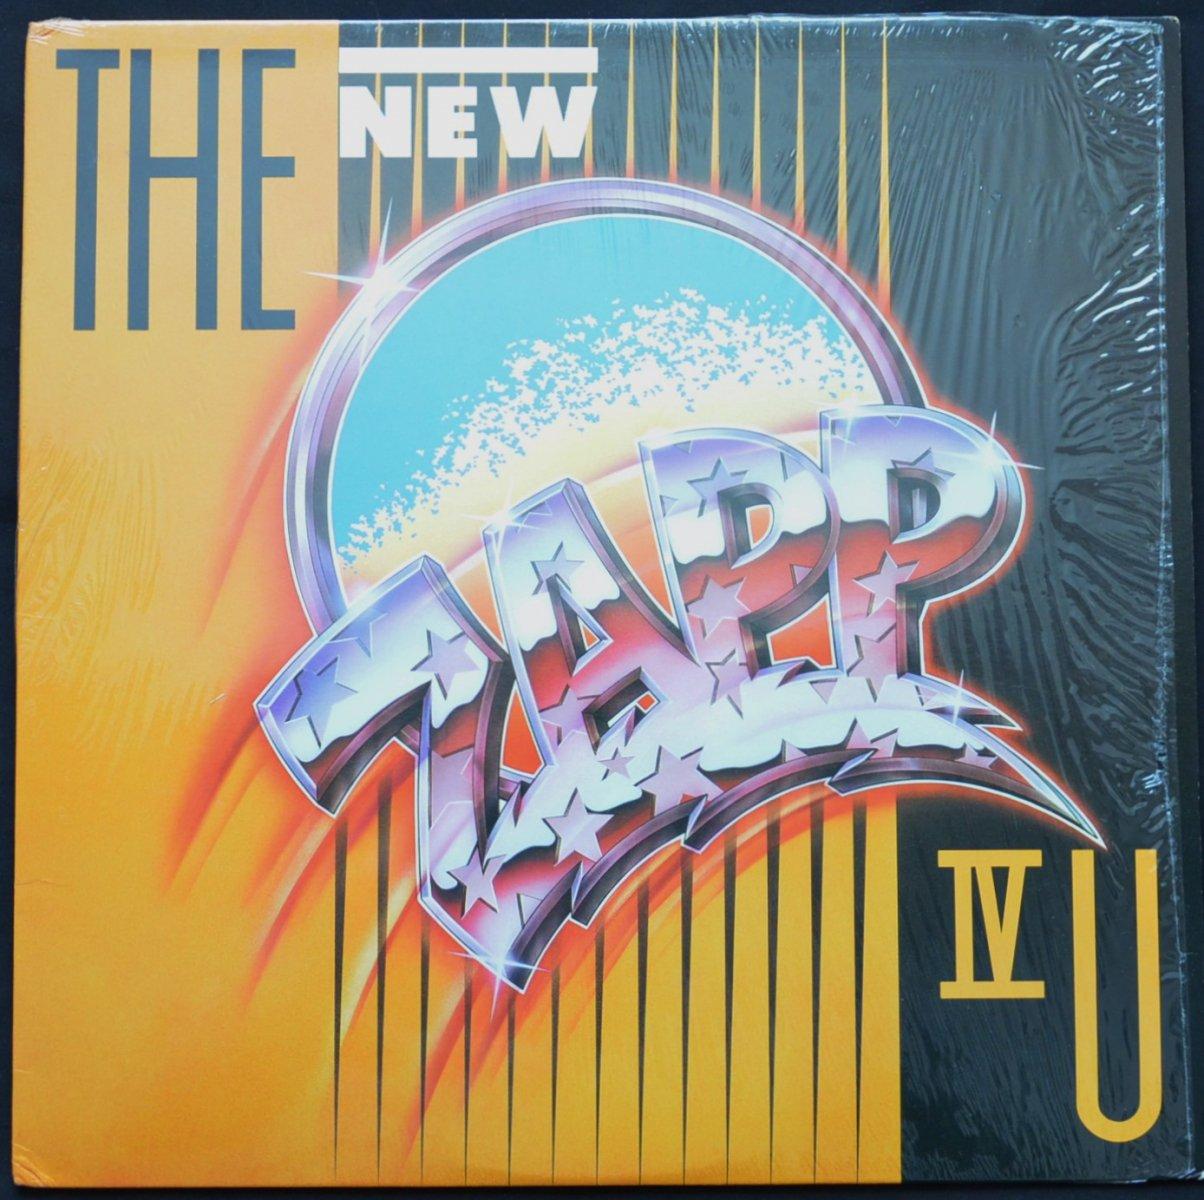 ZAPP / THE NEW ZAPP IV U (LP)